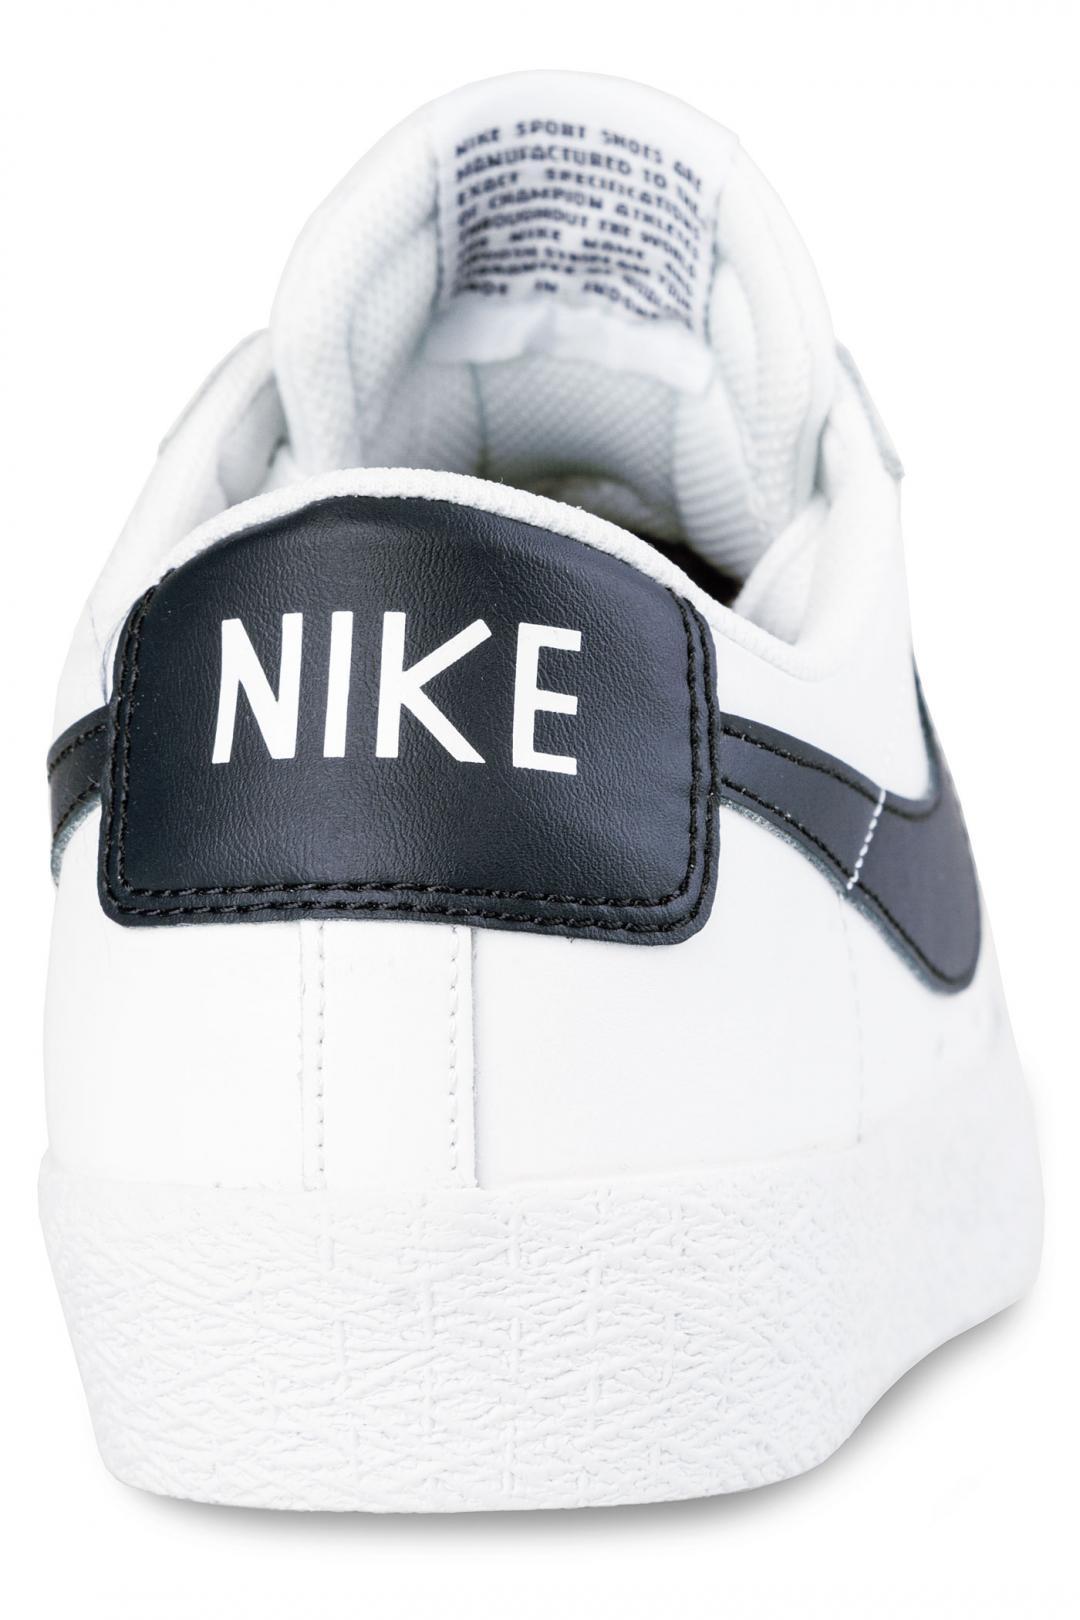 Uomo Nike SB Zoom Blazer Low white obsidian | Sneakers low top